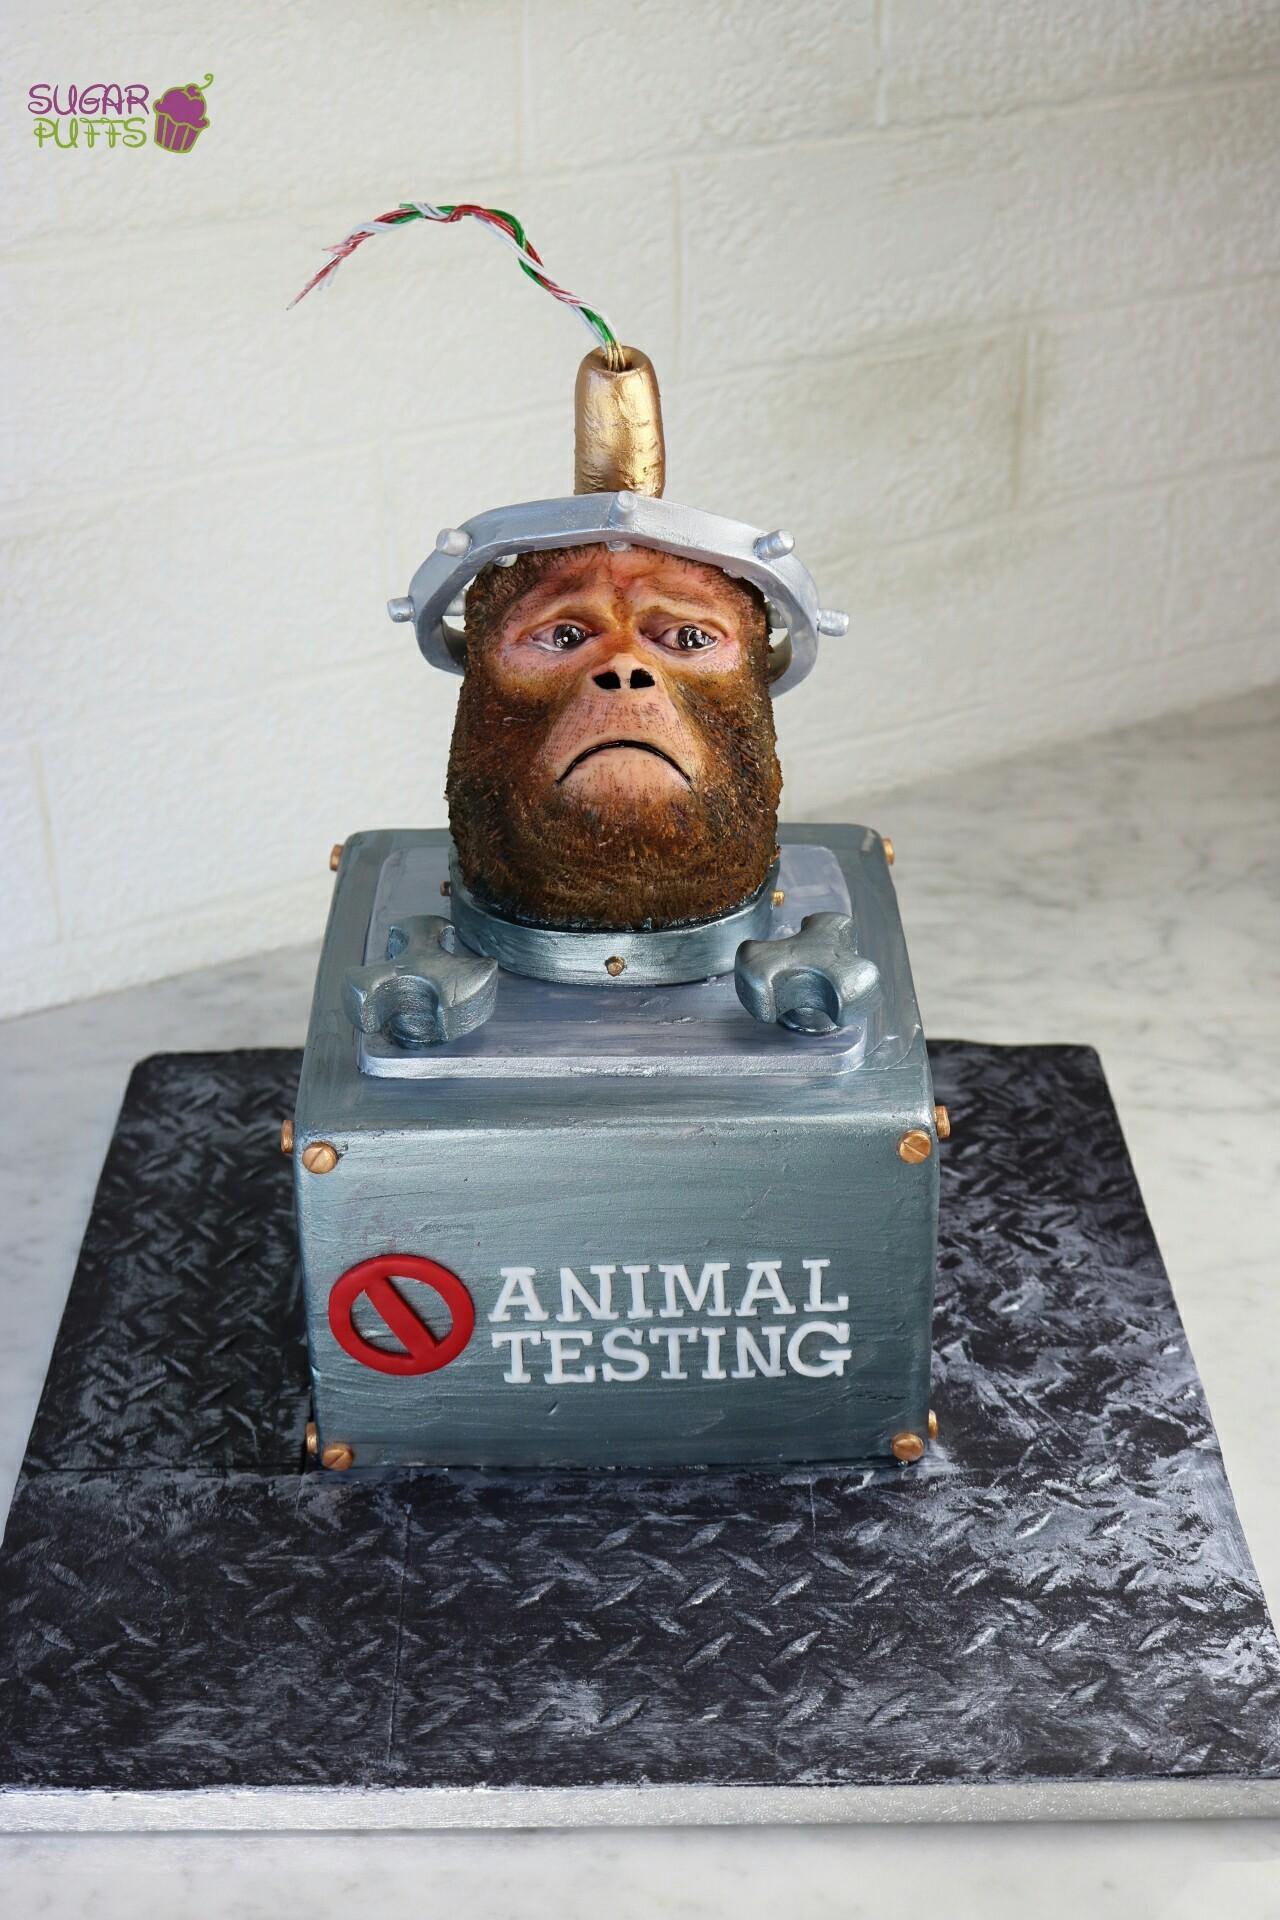 Animal-Rights-Eman-Abukoash-Sugar-Puffs-Cakes-Monkey.jpg#asset:13719